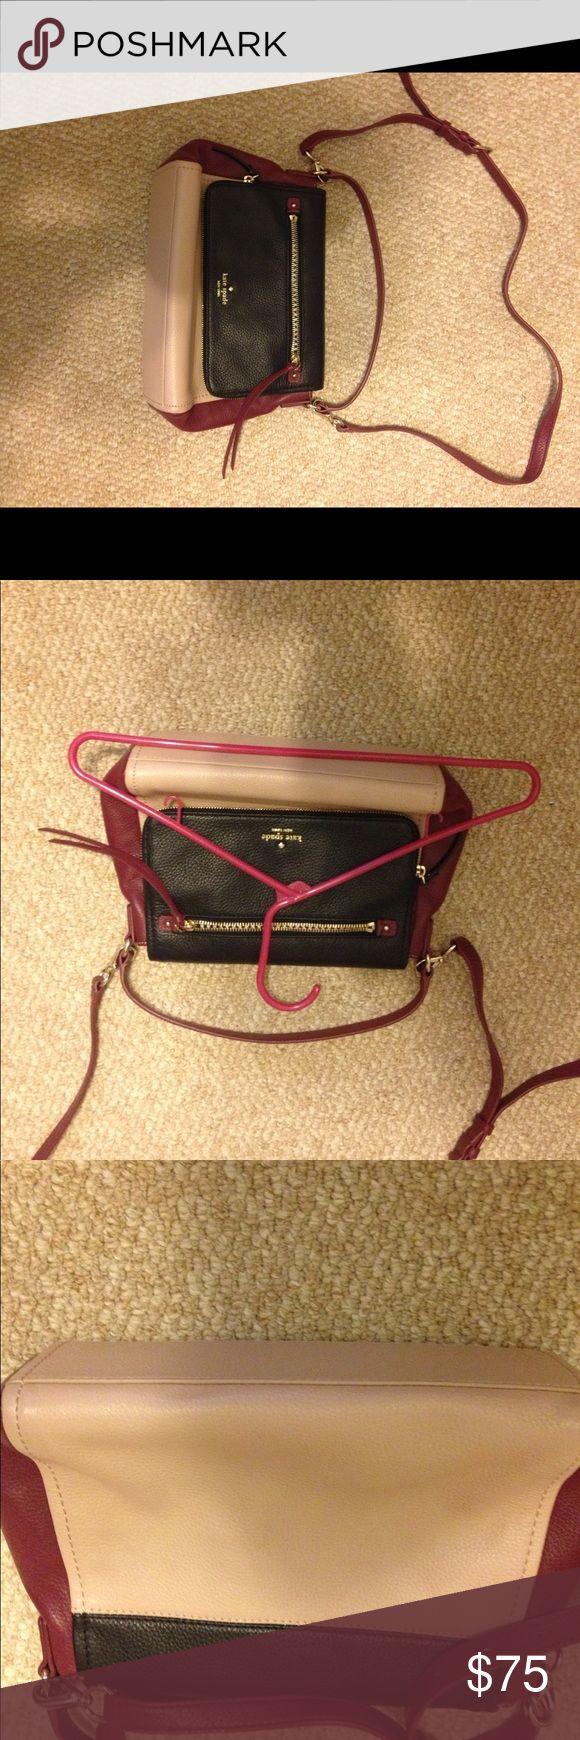 Like new Kate Spate leather crossbody New, pet/smoke free home kate spade Bags Crossbody Bags